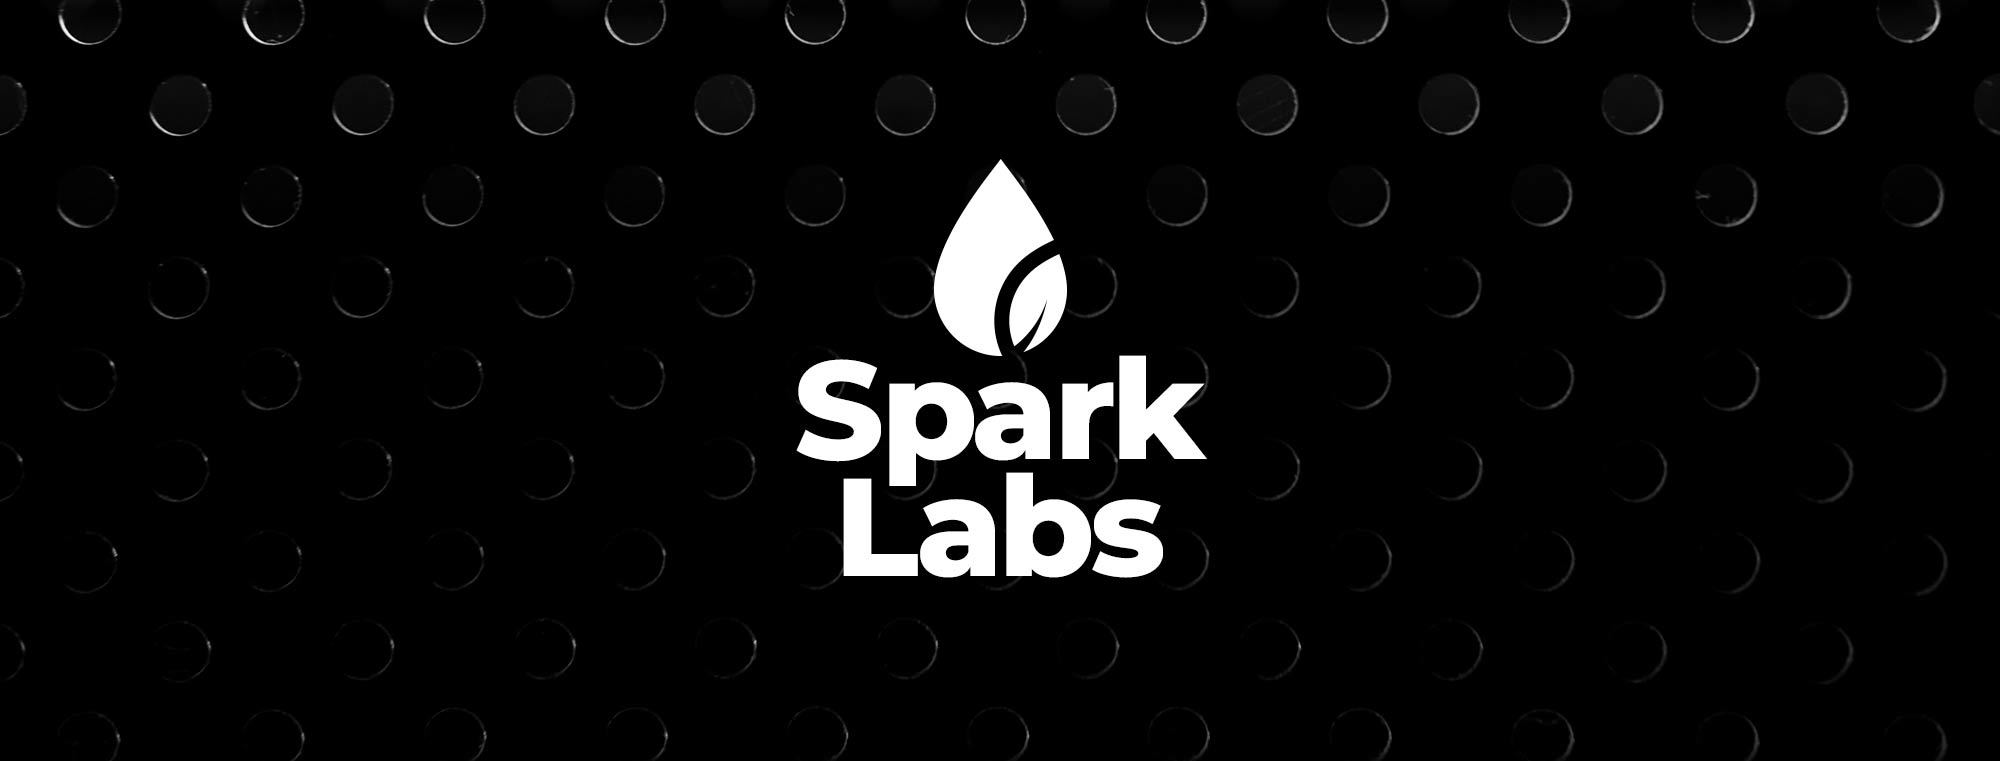 SparkLabs, a Hydrospark think tank